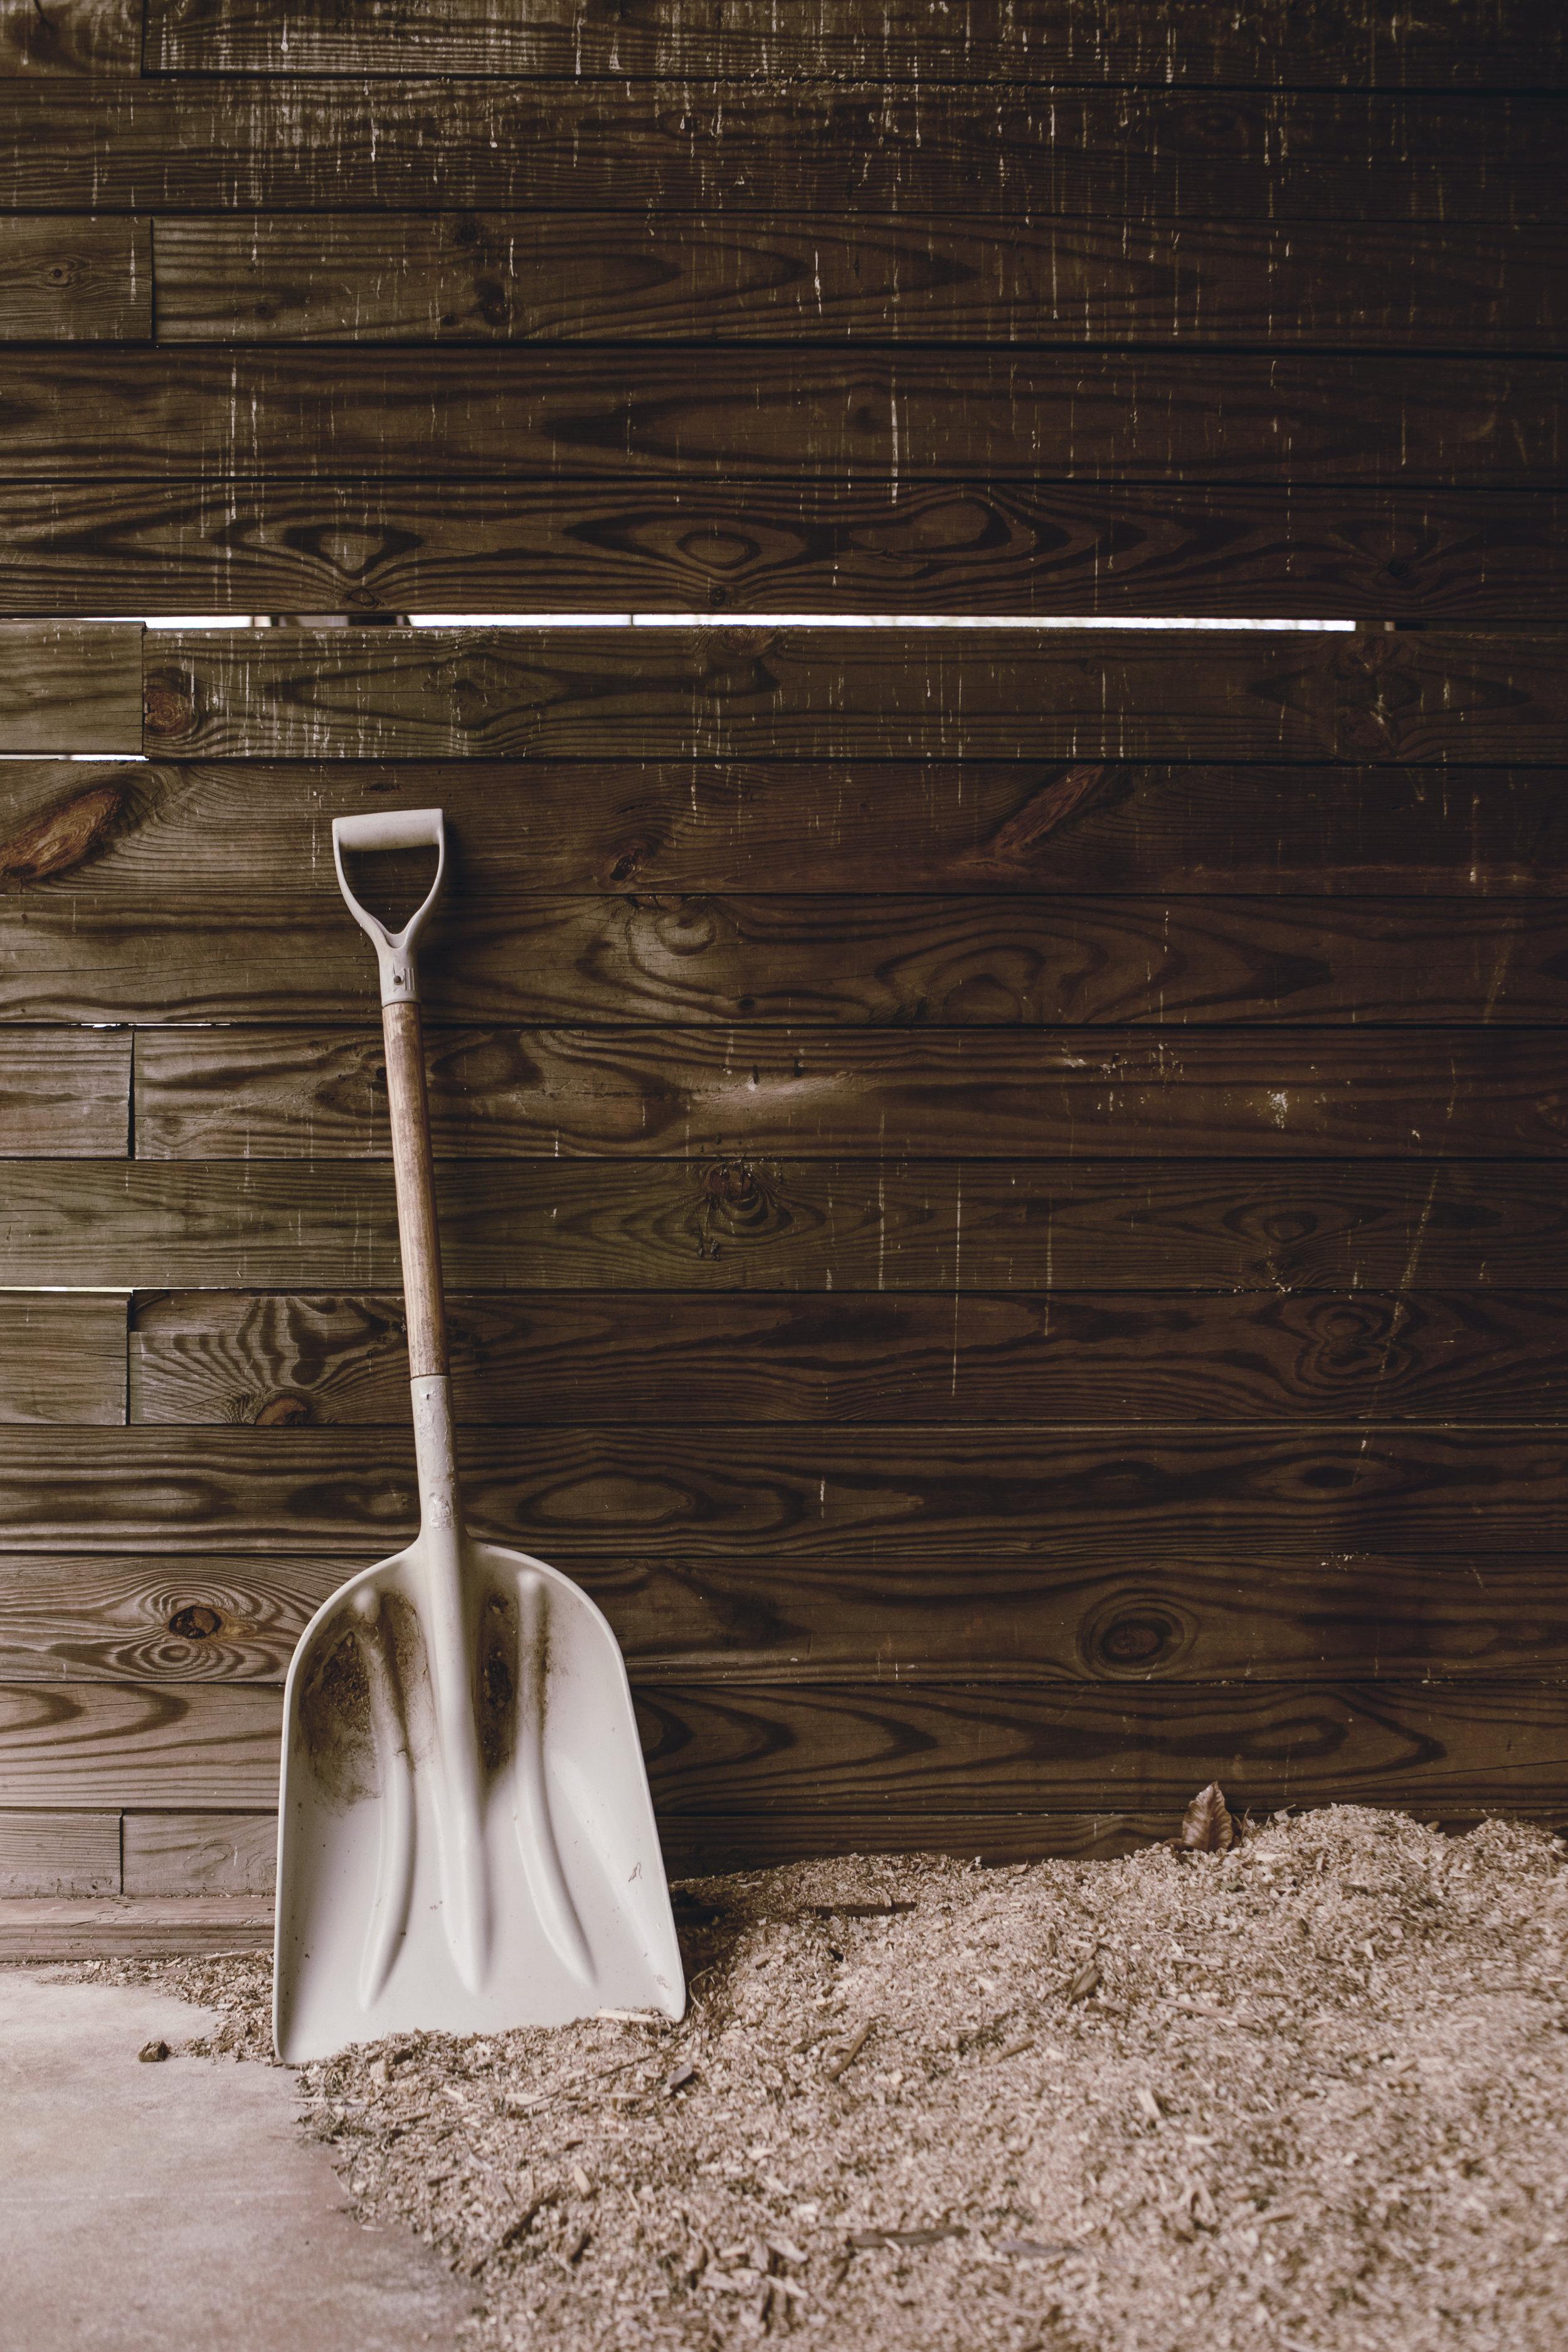 work shovel on rustic barn wood / heirloomed